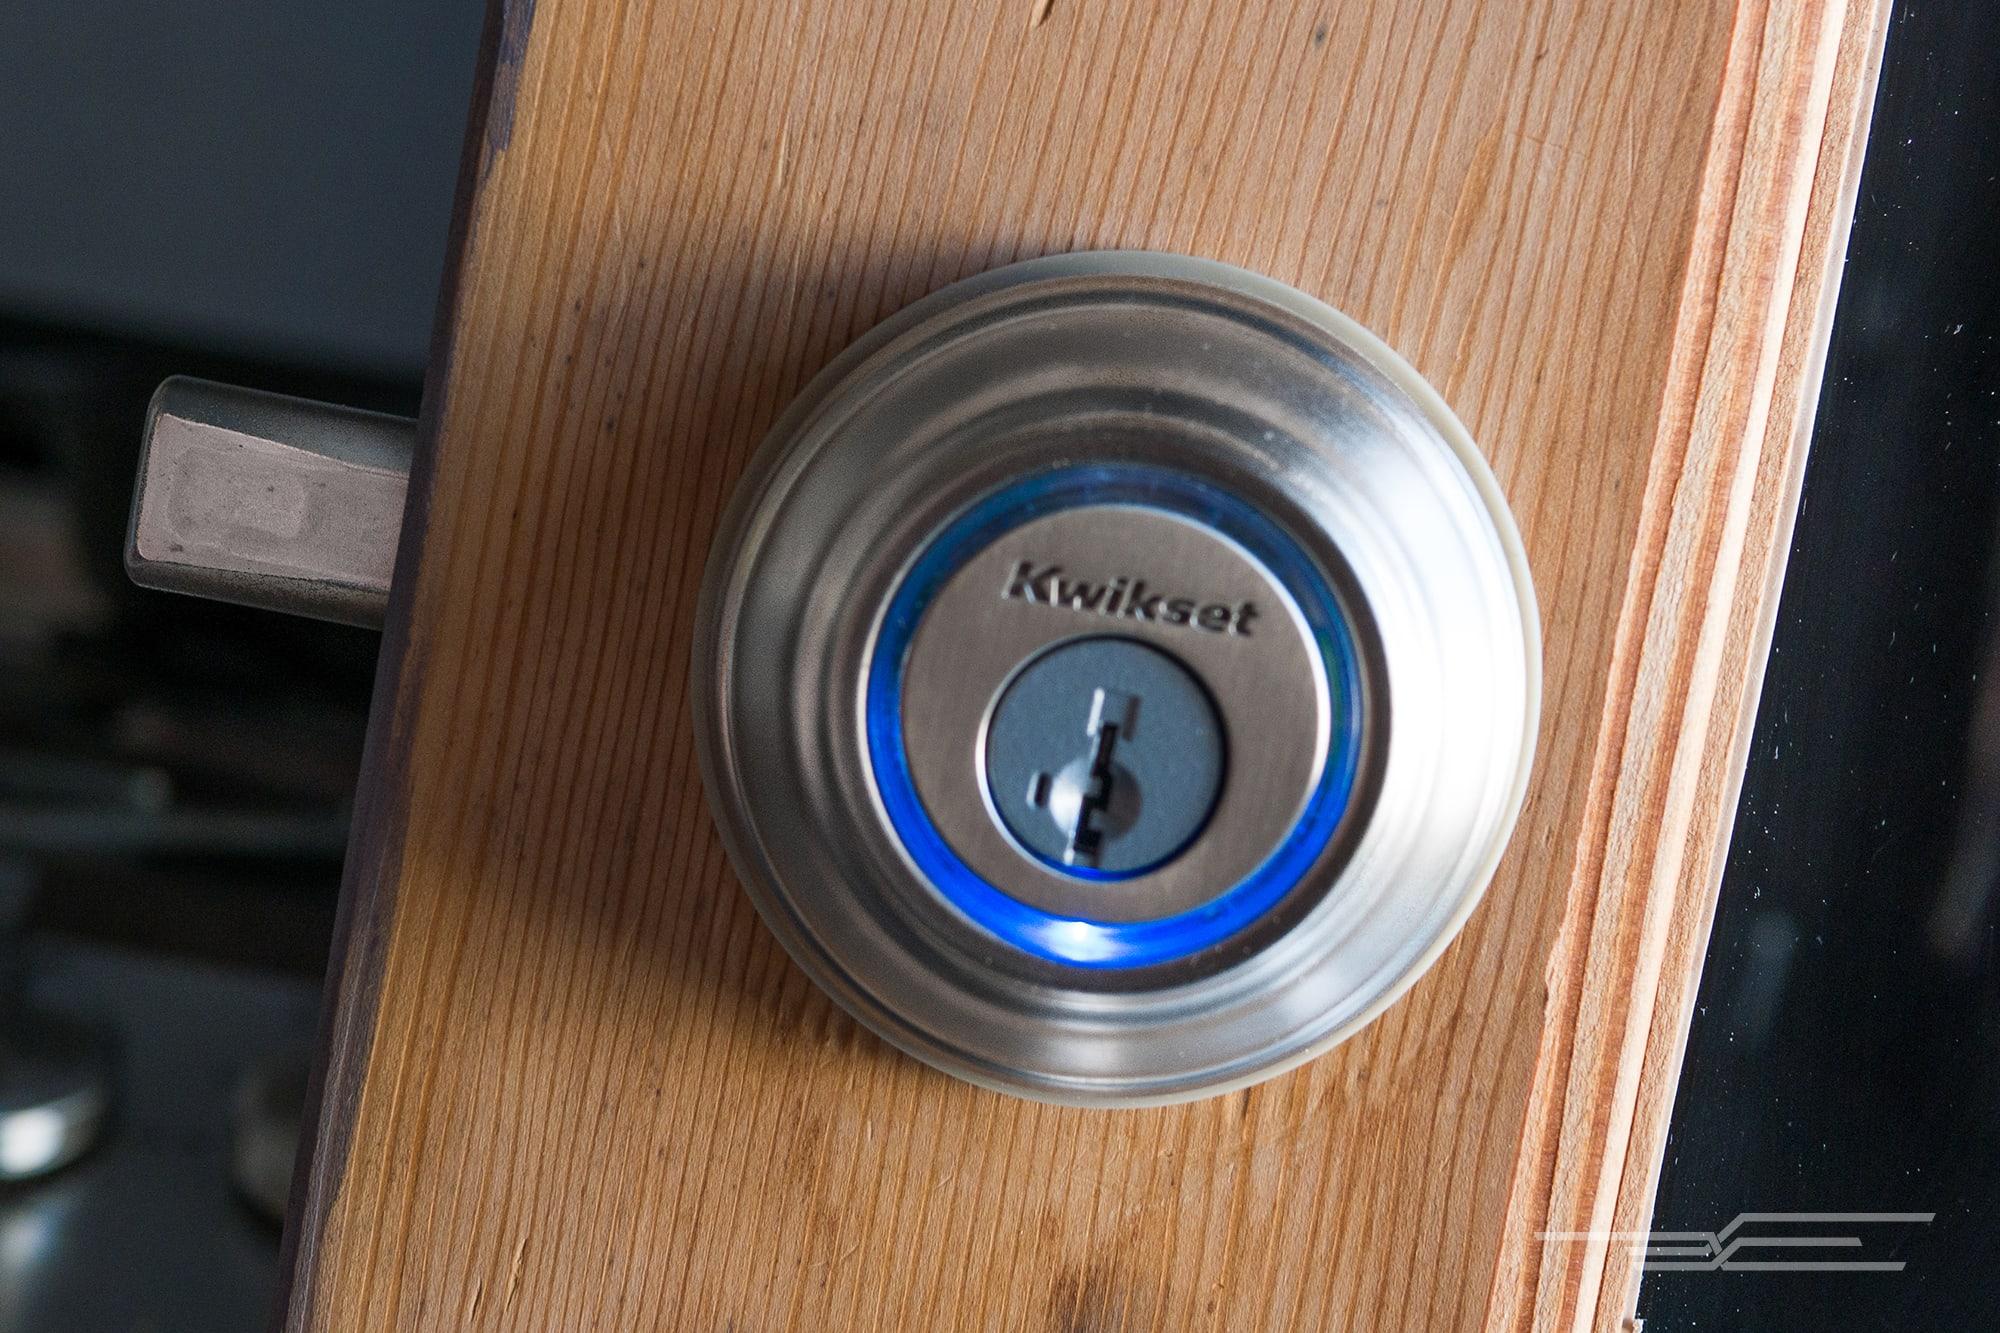 The Best Smart Lock Engadget